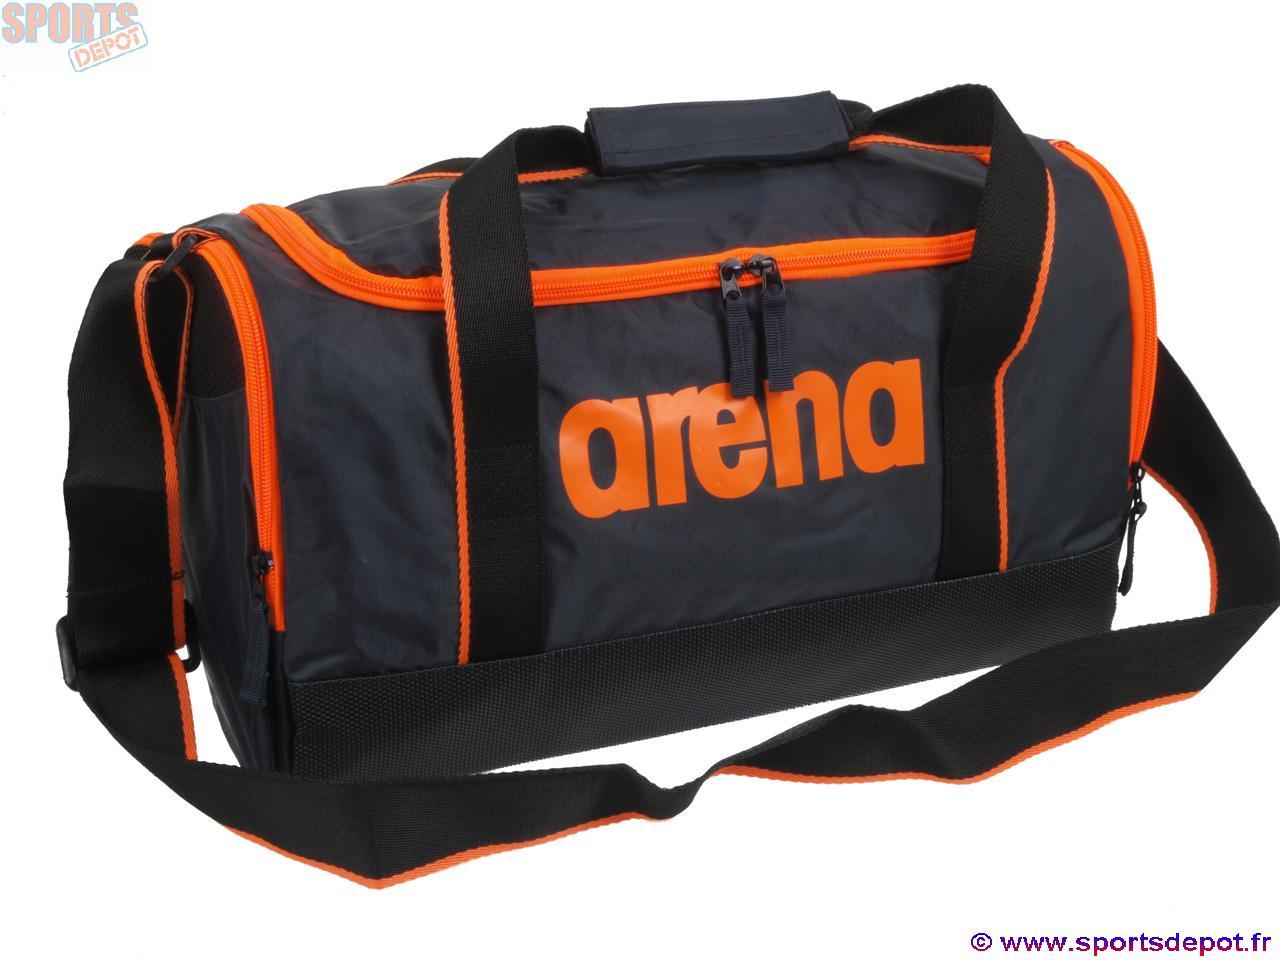 Acheter Sac De Sport ARENA Spiky 442225cm Homme